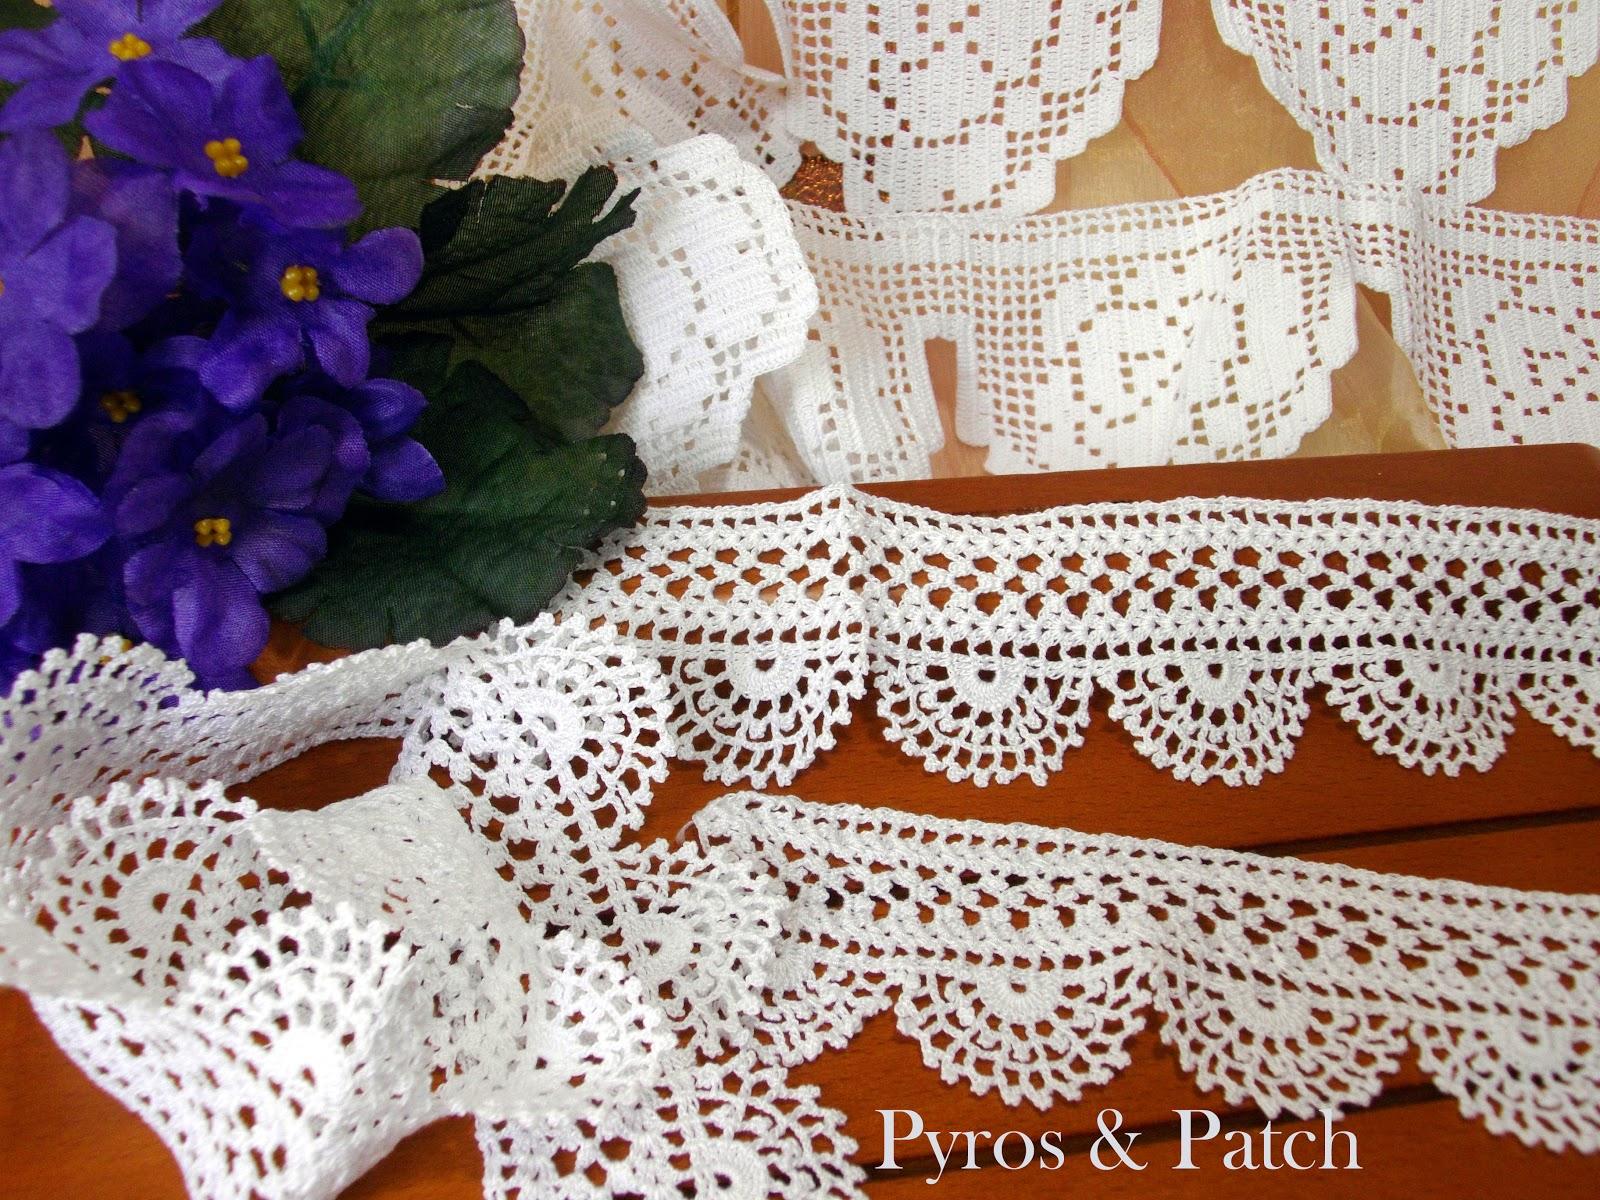 Pyros patch merletti crochet for Merletti uncinetto schemi